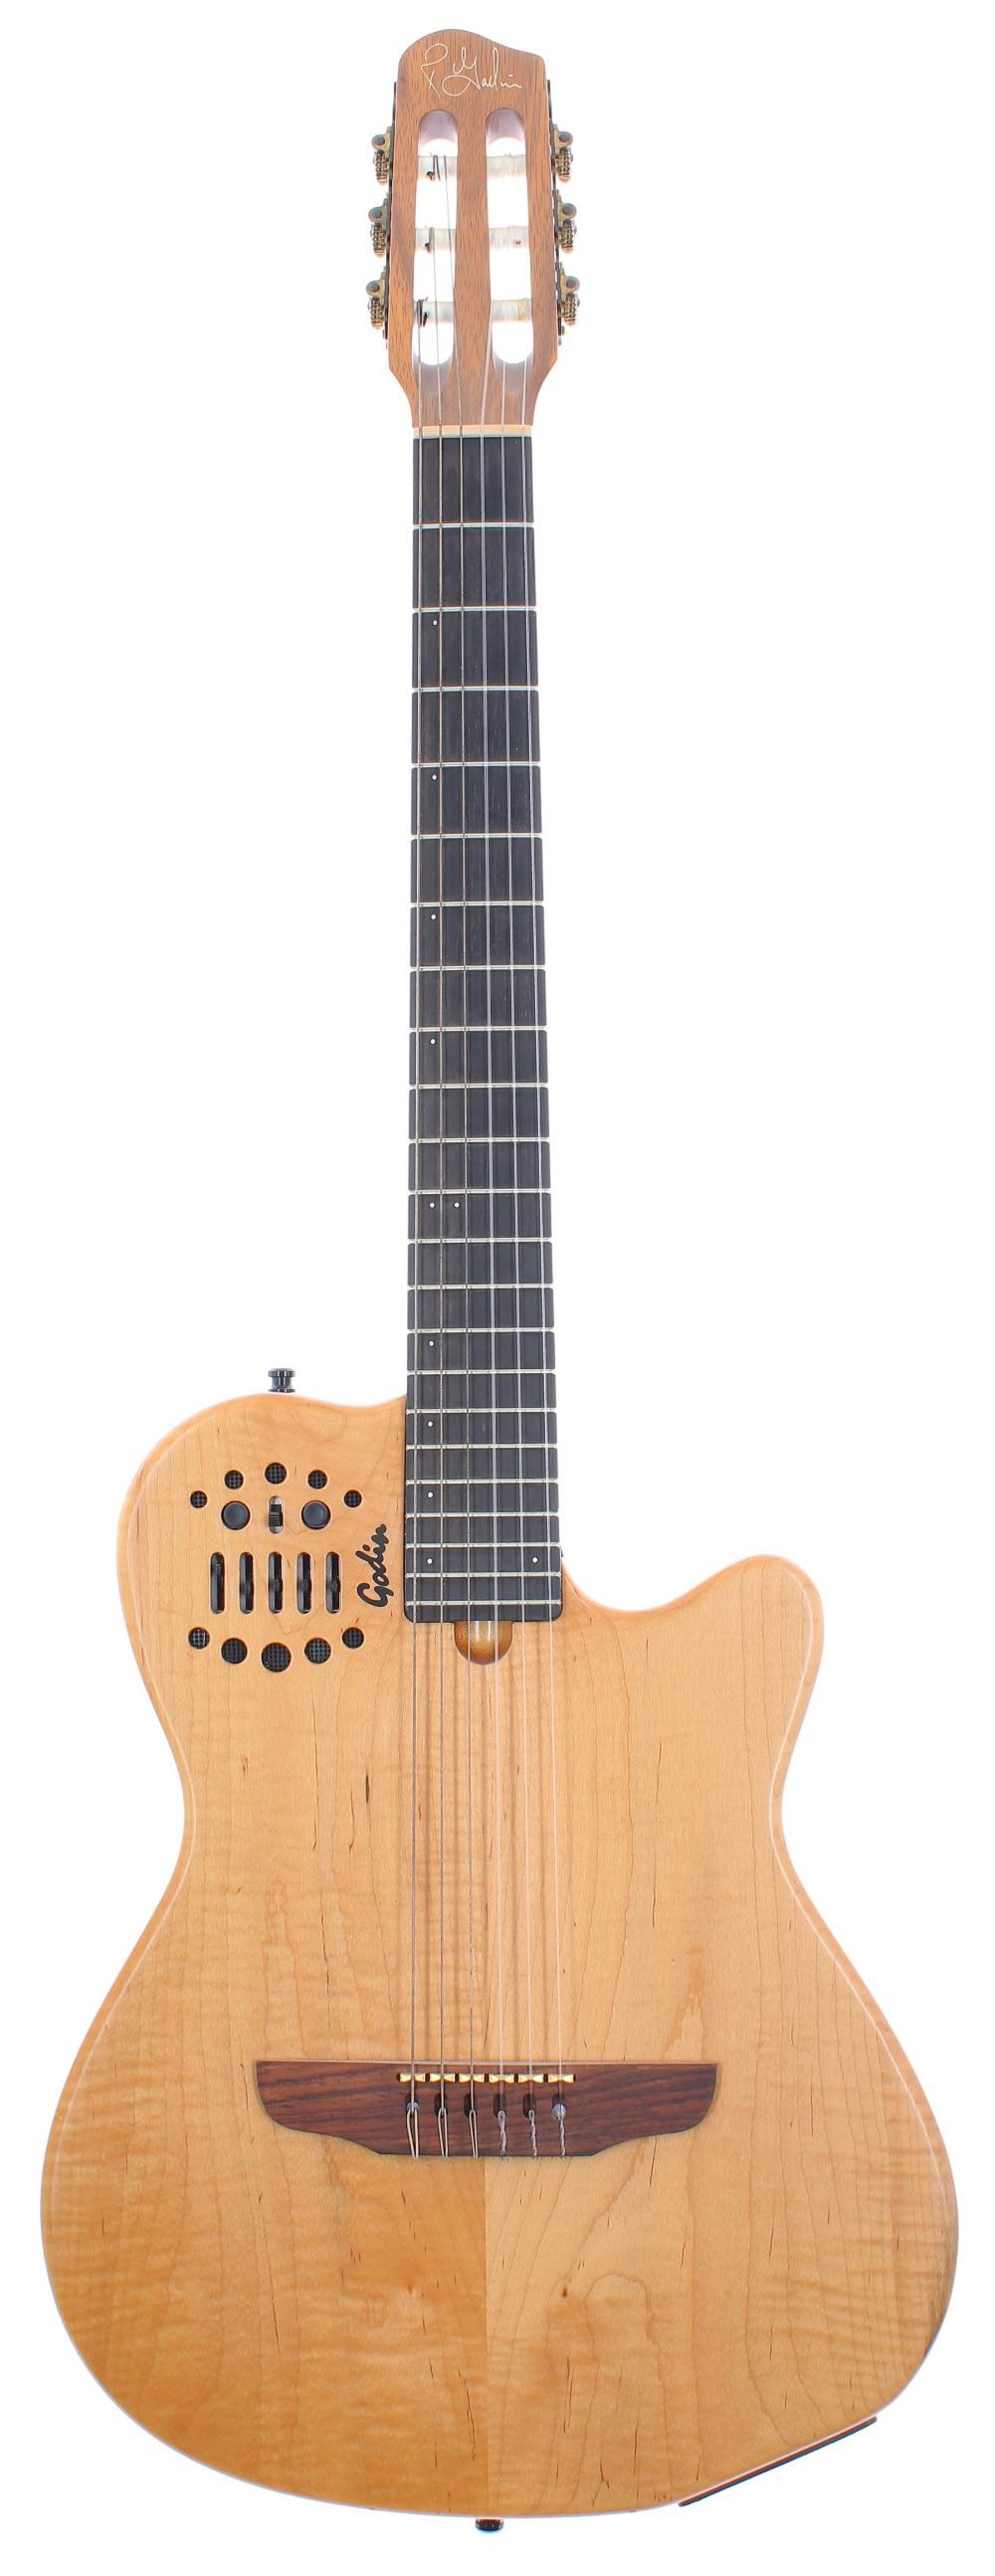 Godin Multiac ACS Nylon guitar, ser. no. 99xxxxx9; Finish: natural; Fretboard: ebony; Frets: good;